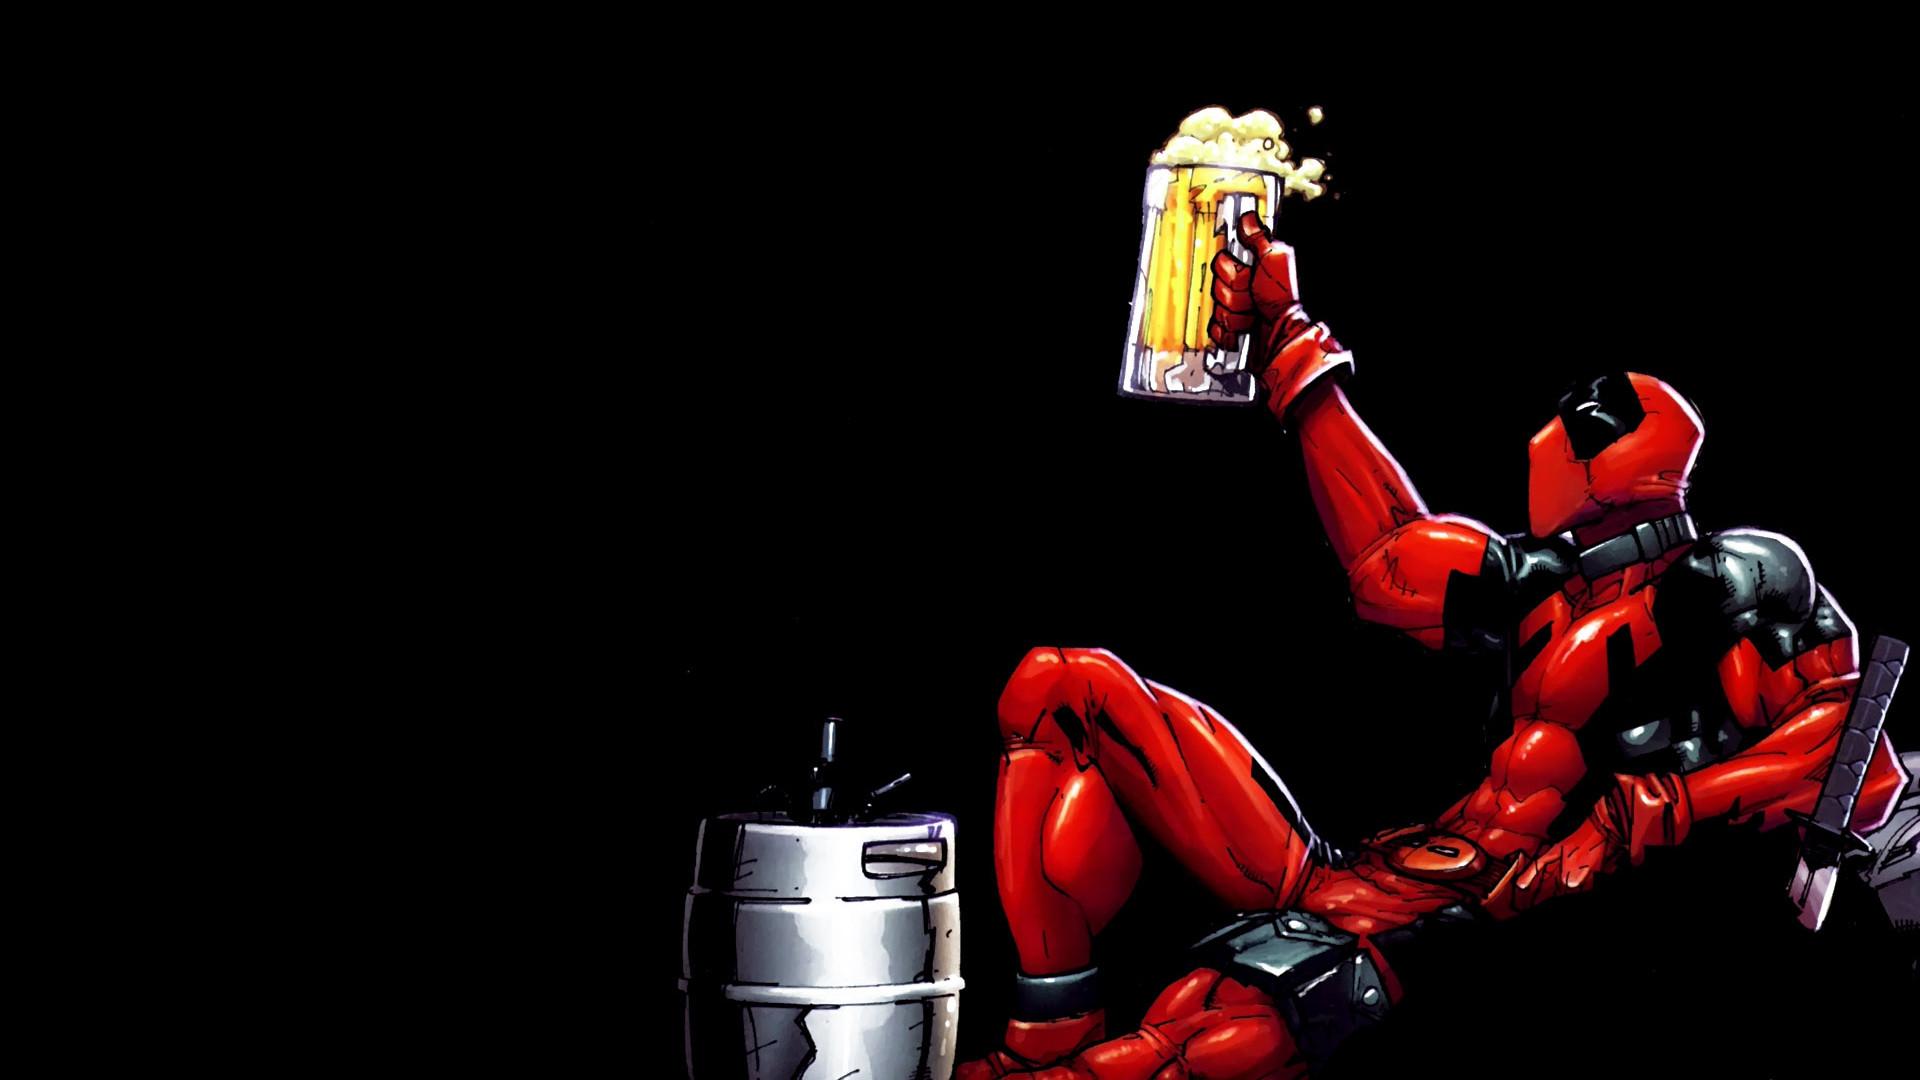 Res: 1920x1080, Marvel Deadpool Hd Wallpapers 1080p